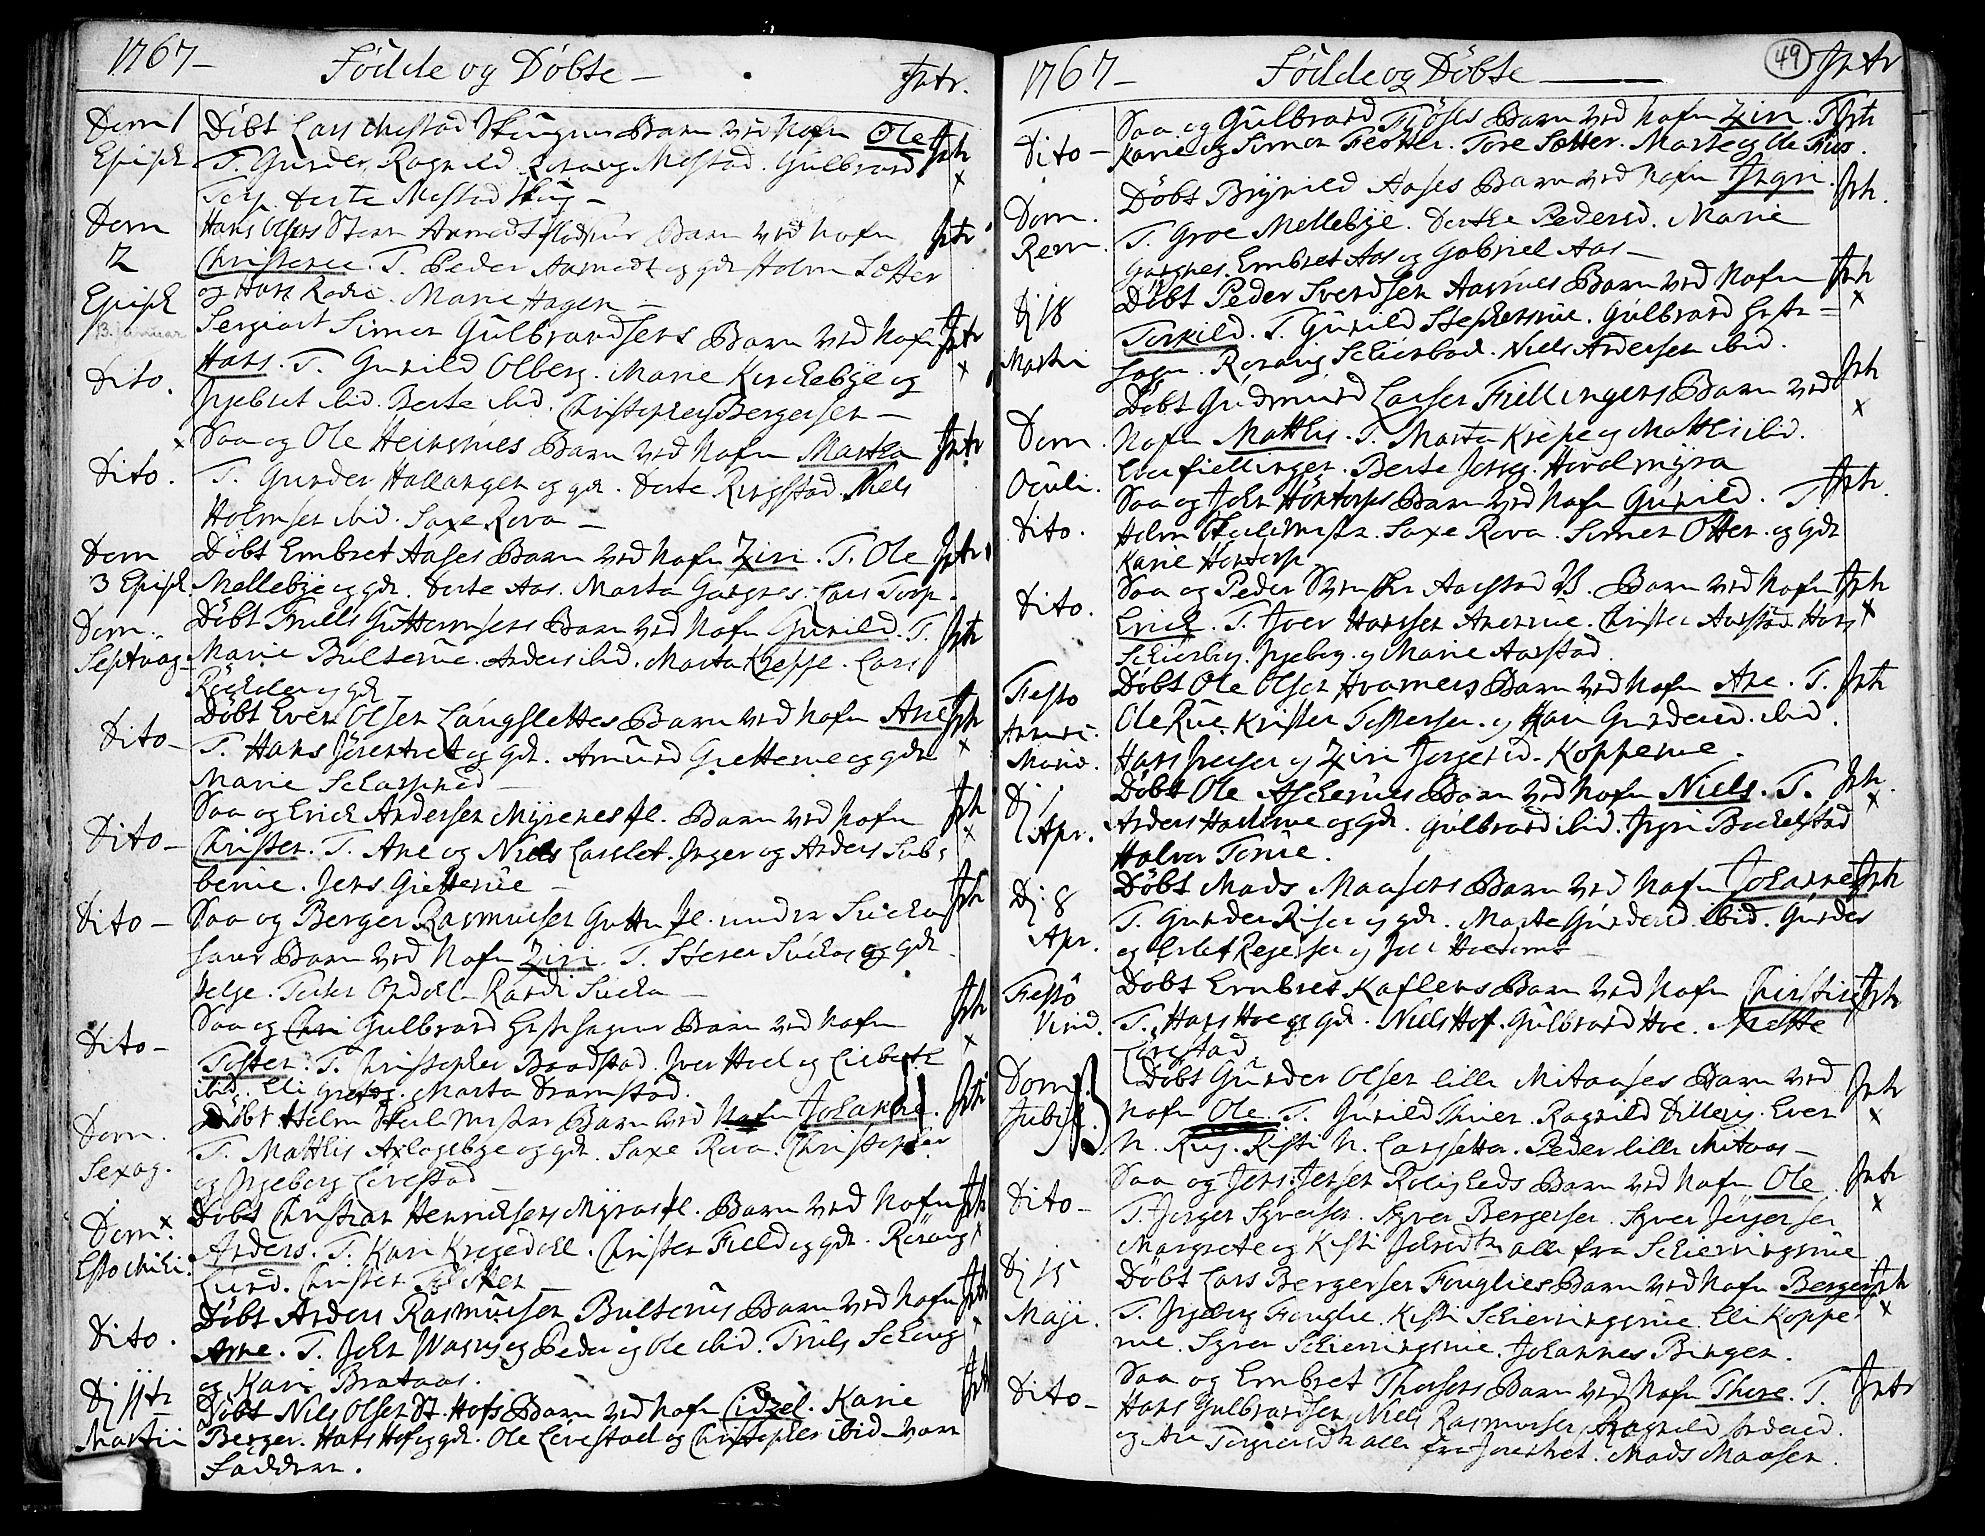 SAO, Trøgstad prestekontor Kirkebøker, F/Fa/L0004: Ministerialbok nr. I 4, 1750-1784, s. 49